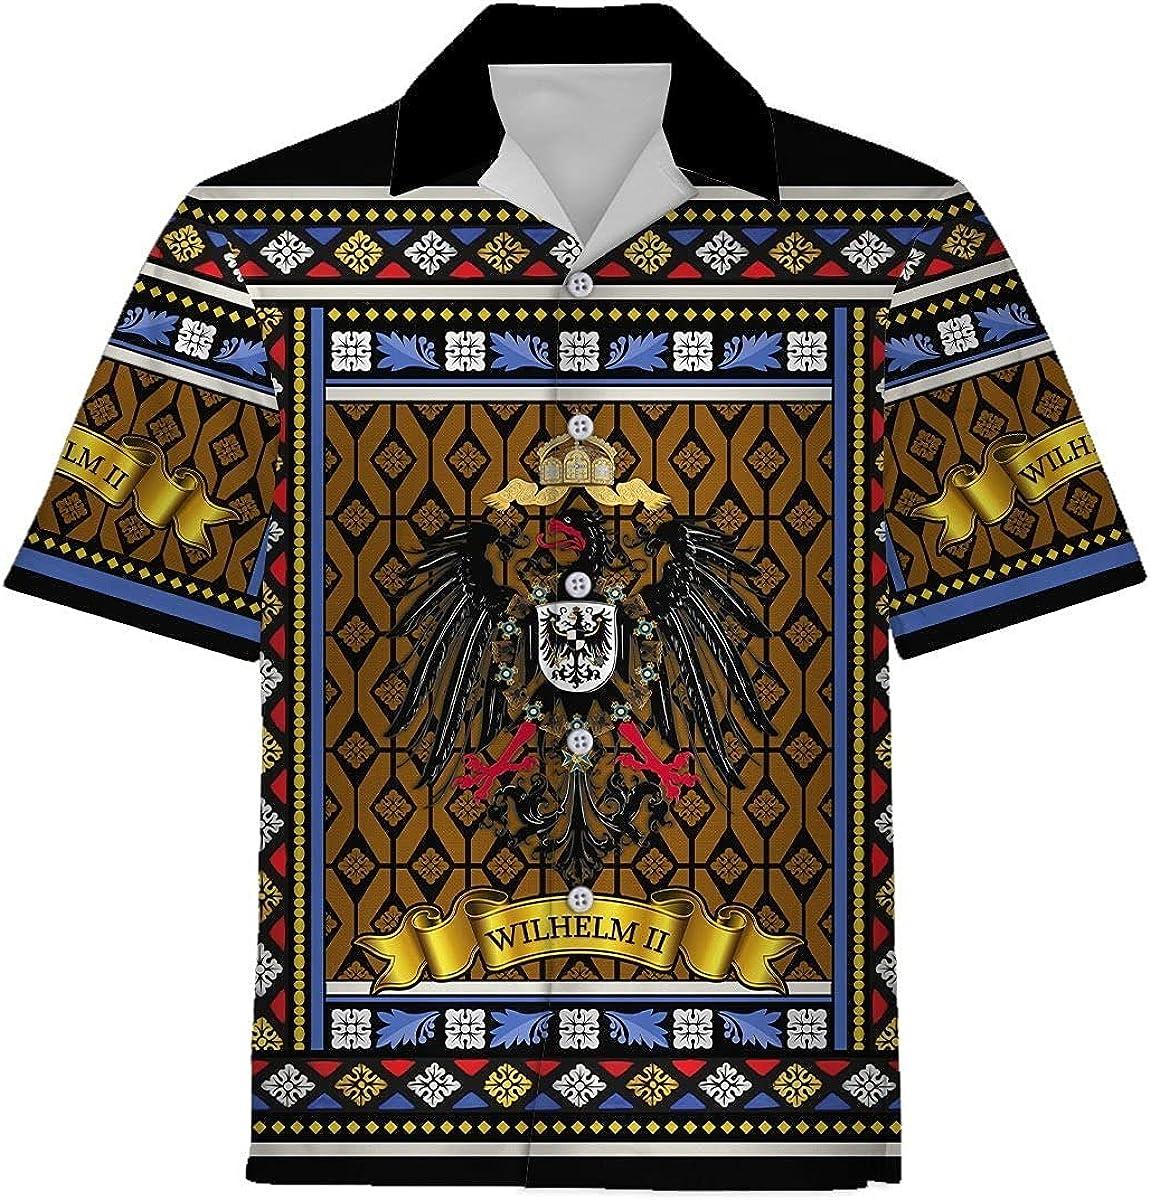 XStyles18 SEAL limited product Unisex Wilhelm II Challenge the lowest price of Japan ☆ Hawaiian Ha Shirts